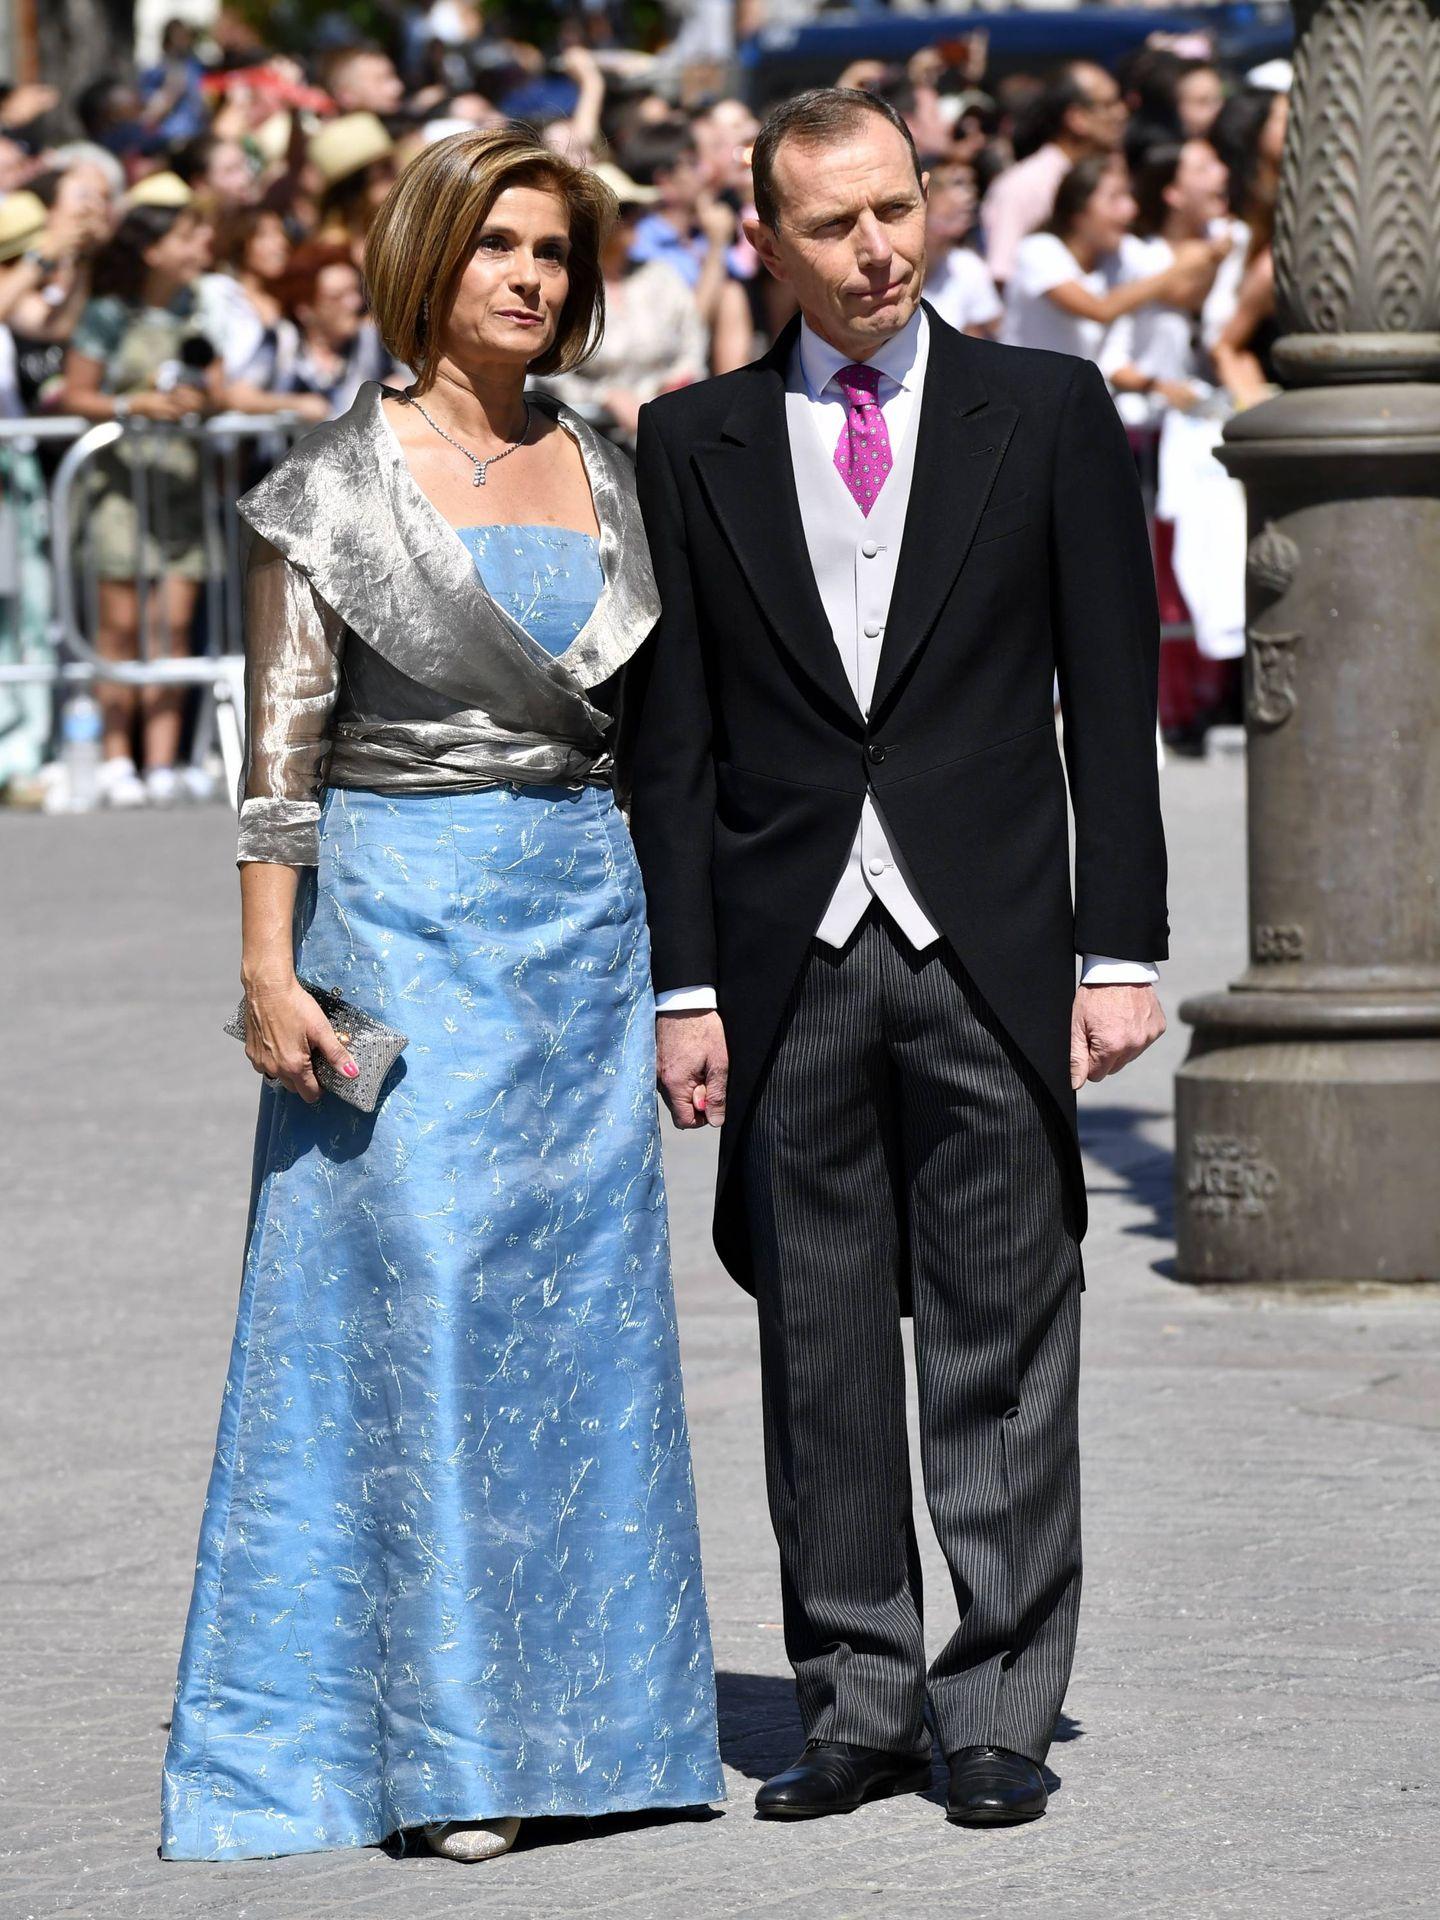 Emilio Butragueño  y su mujer, Sonia González. (Cordon Press)